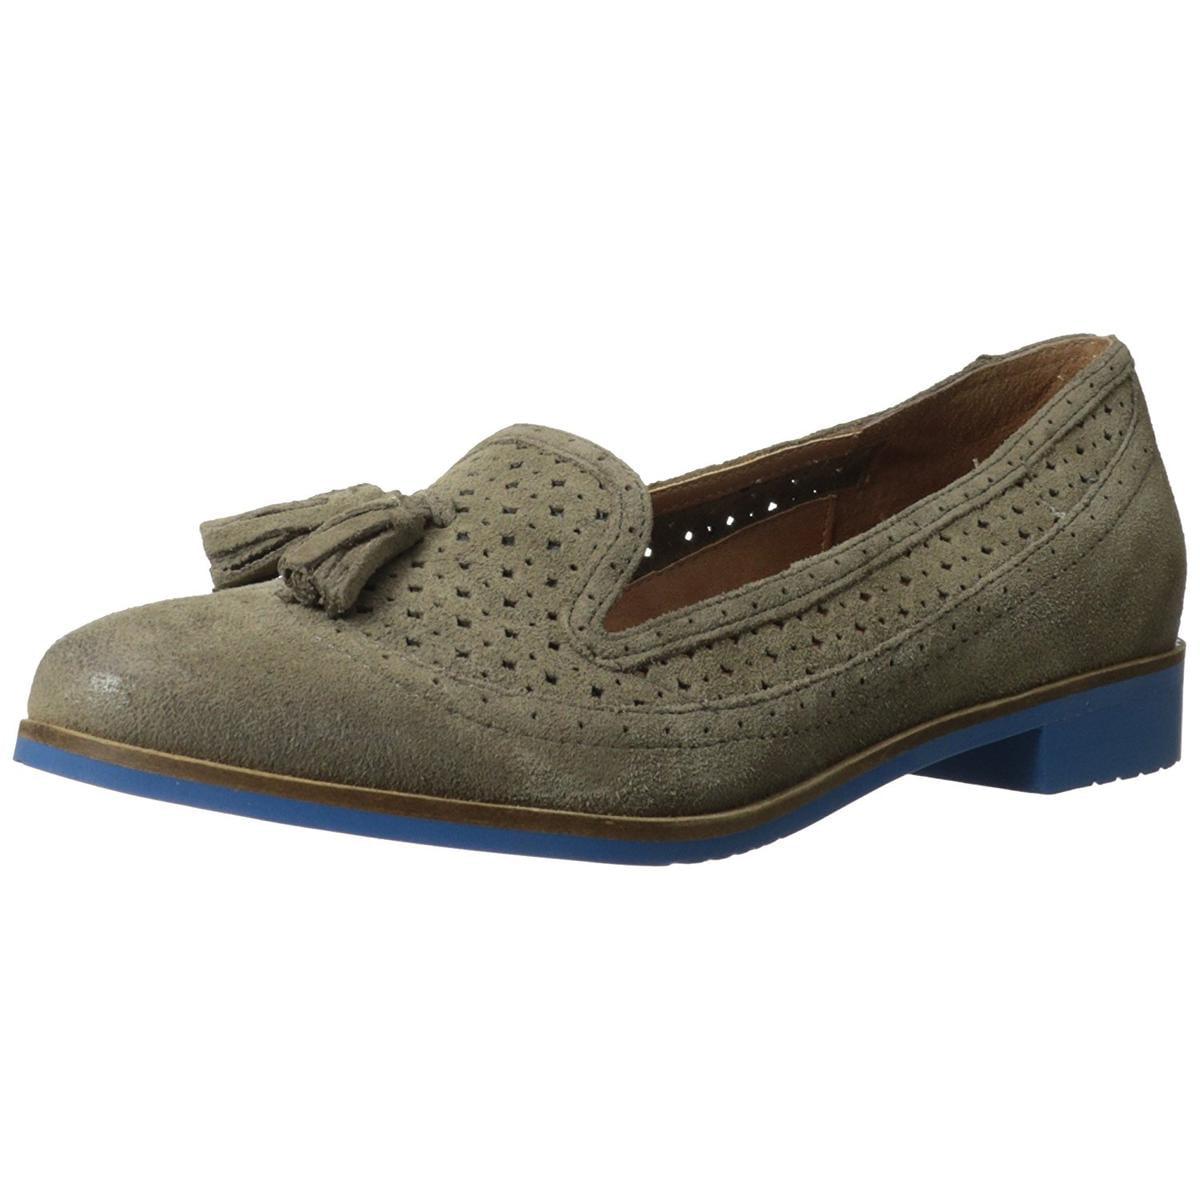 Nicole Karine Women's Stone Slip-On Loafer 6M